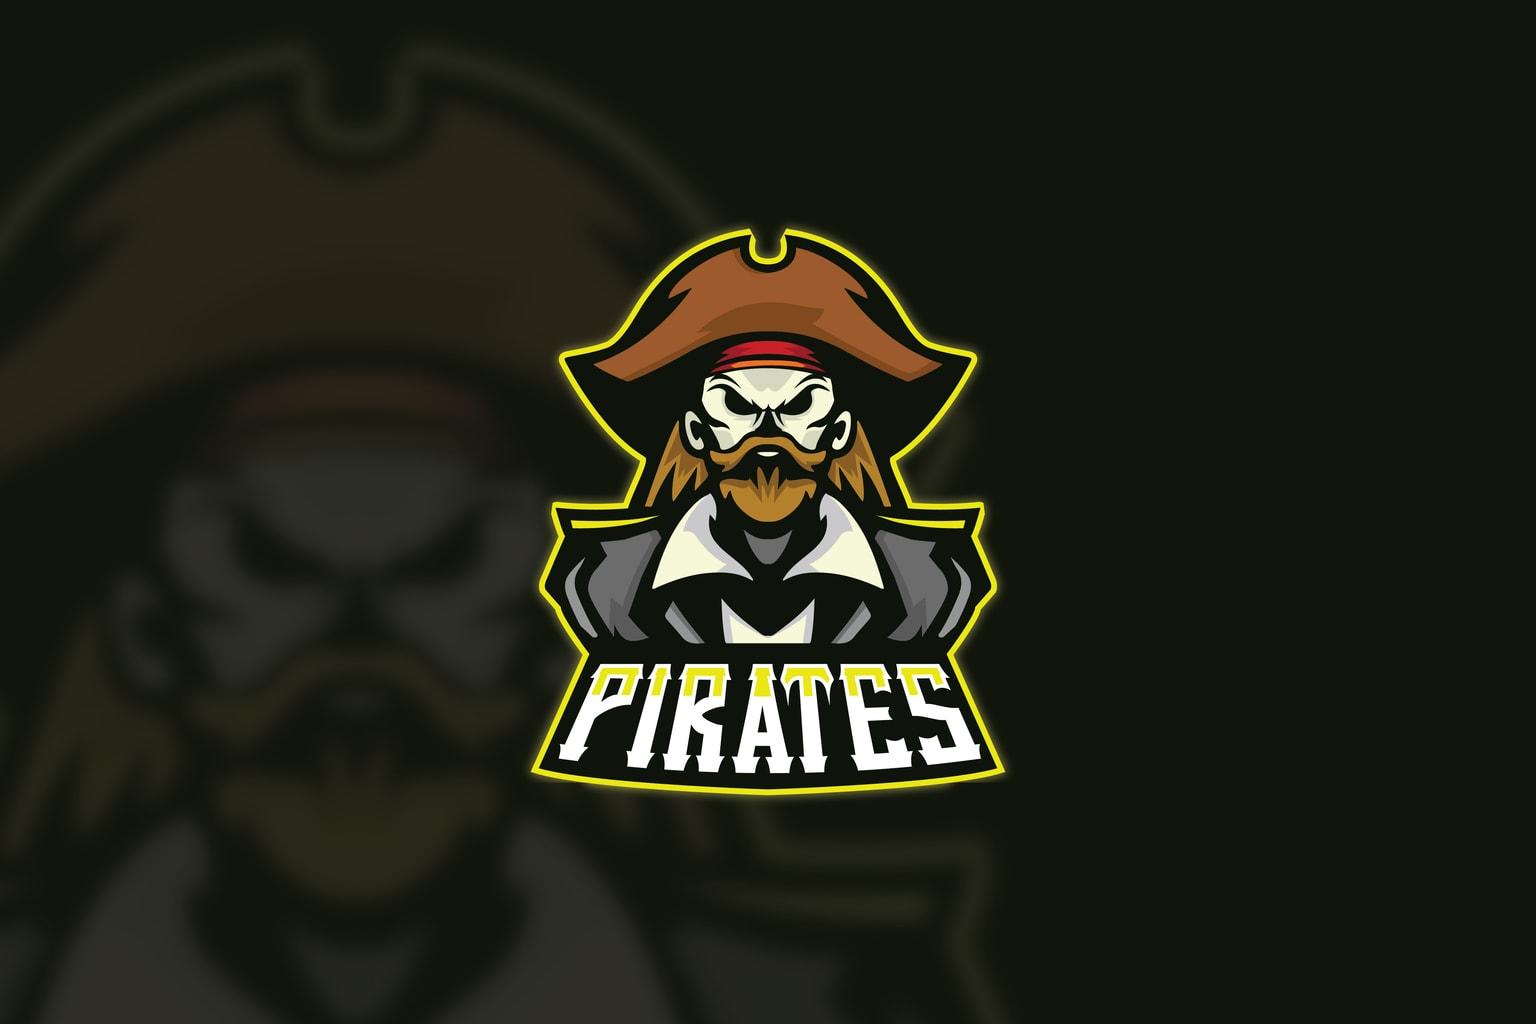 esport logo pirate authority